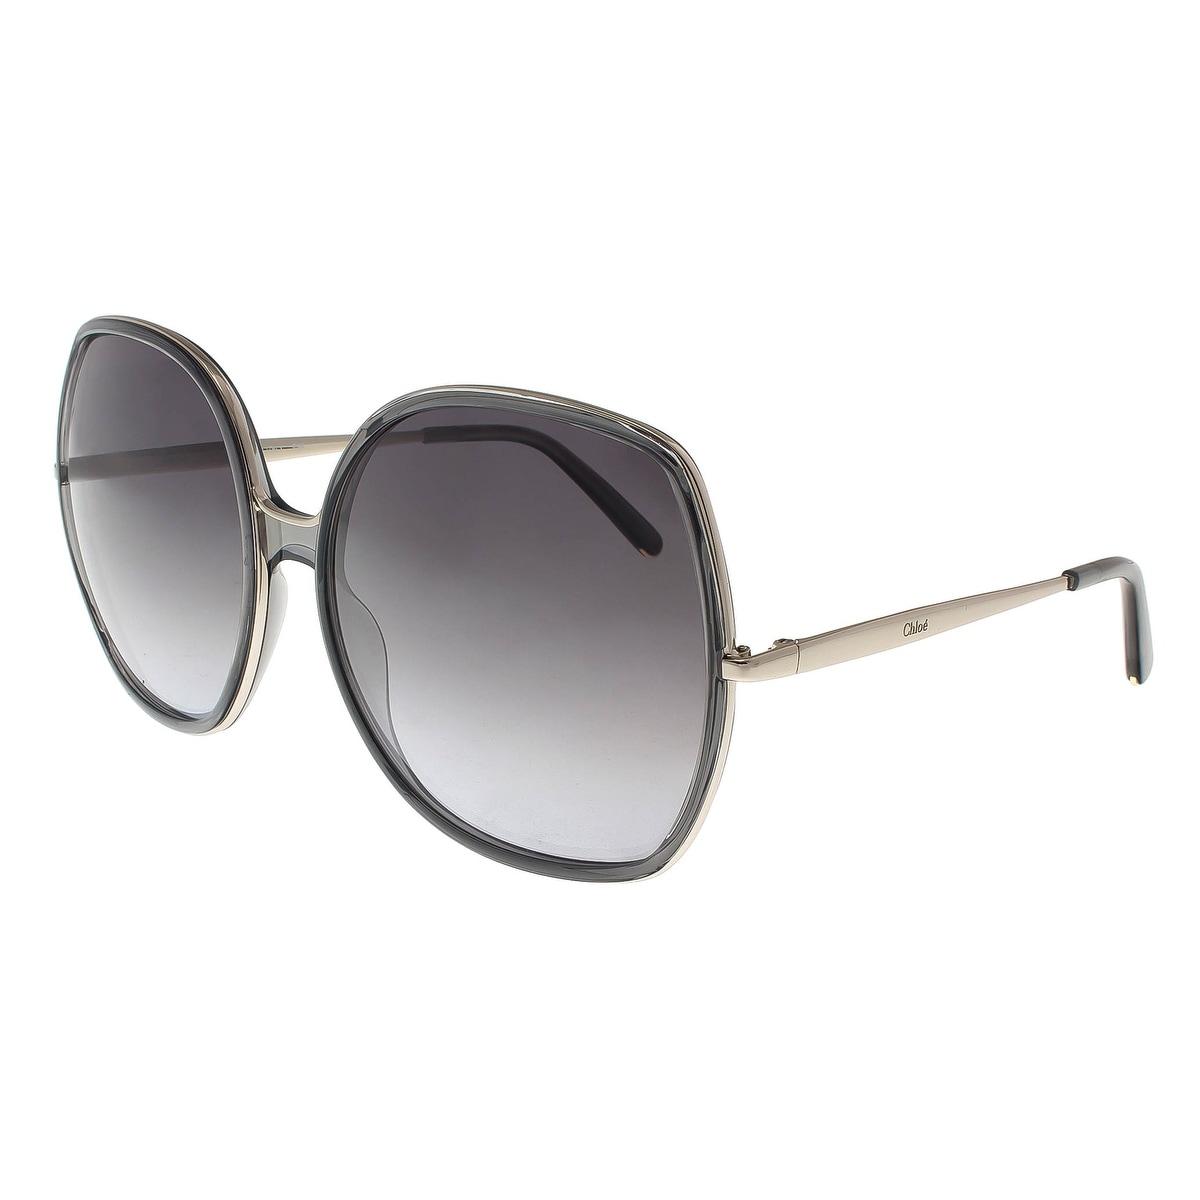 78d847825ed Shop Chloe CE725 S 036 Dark Grey Square Sunglasses - 62-17-135 ...